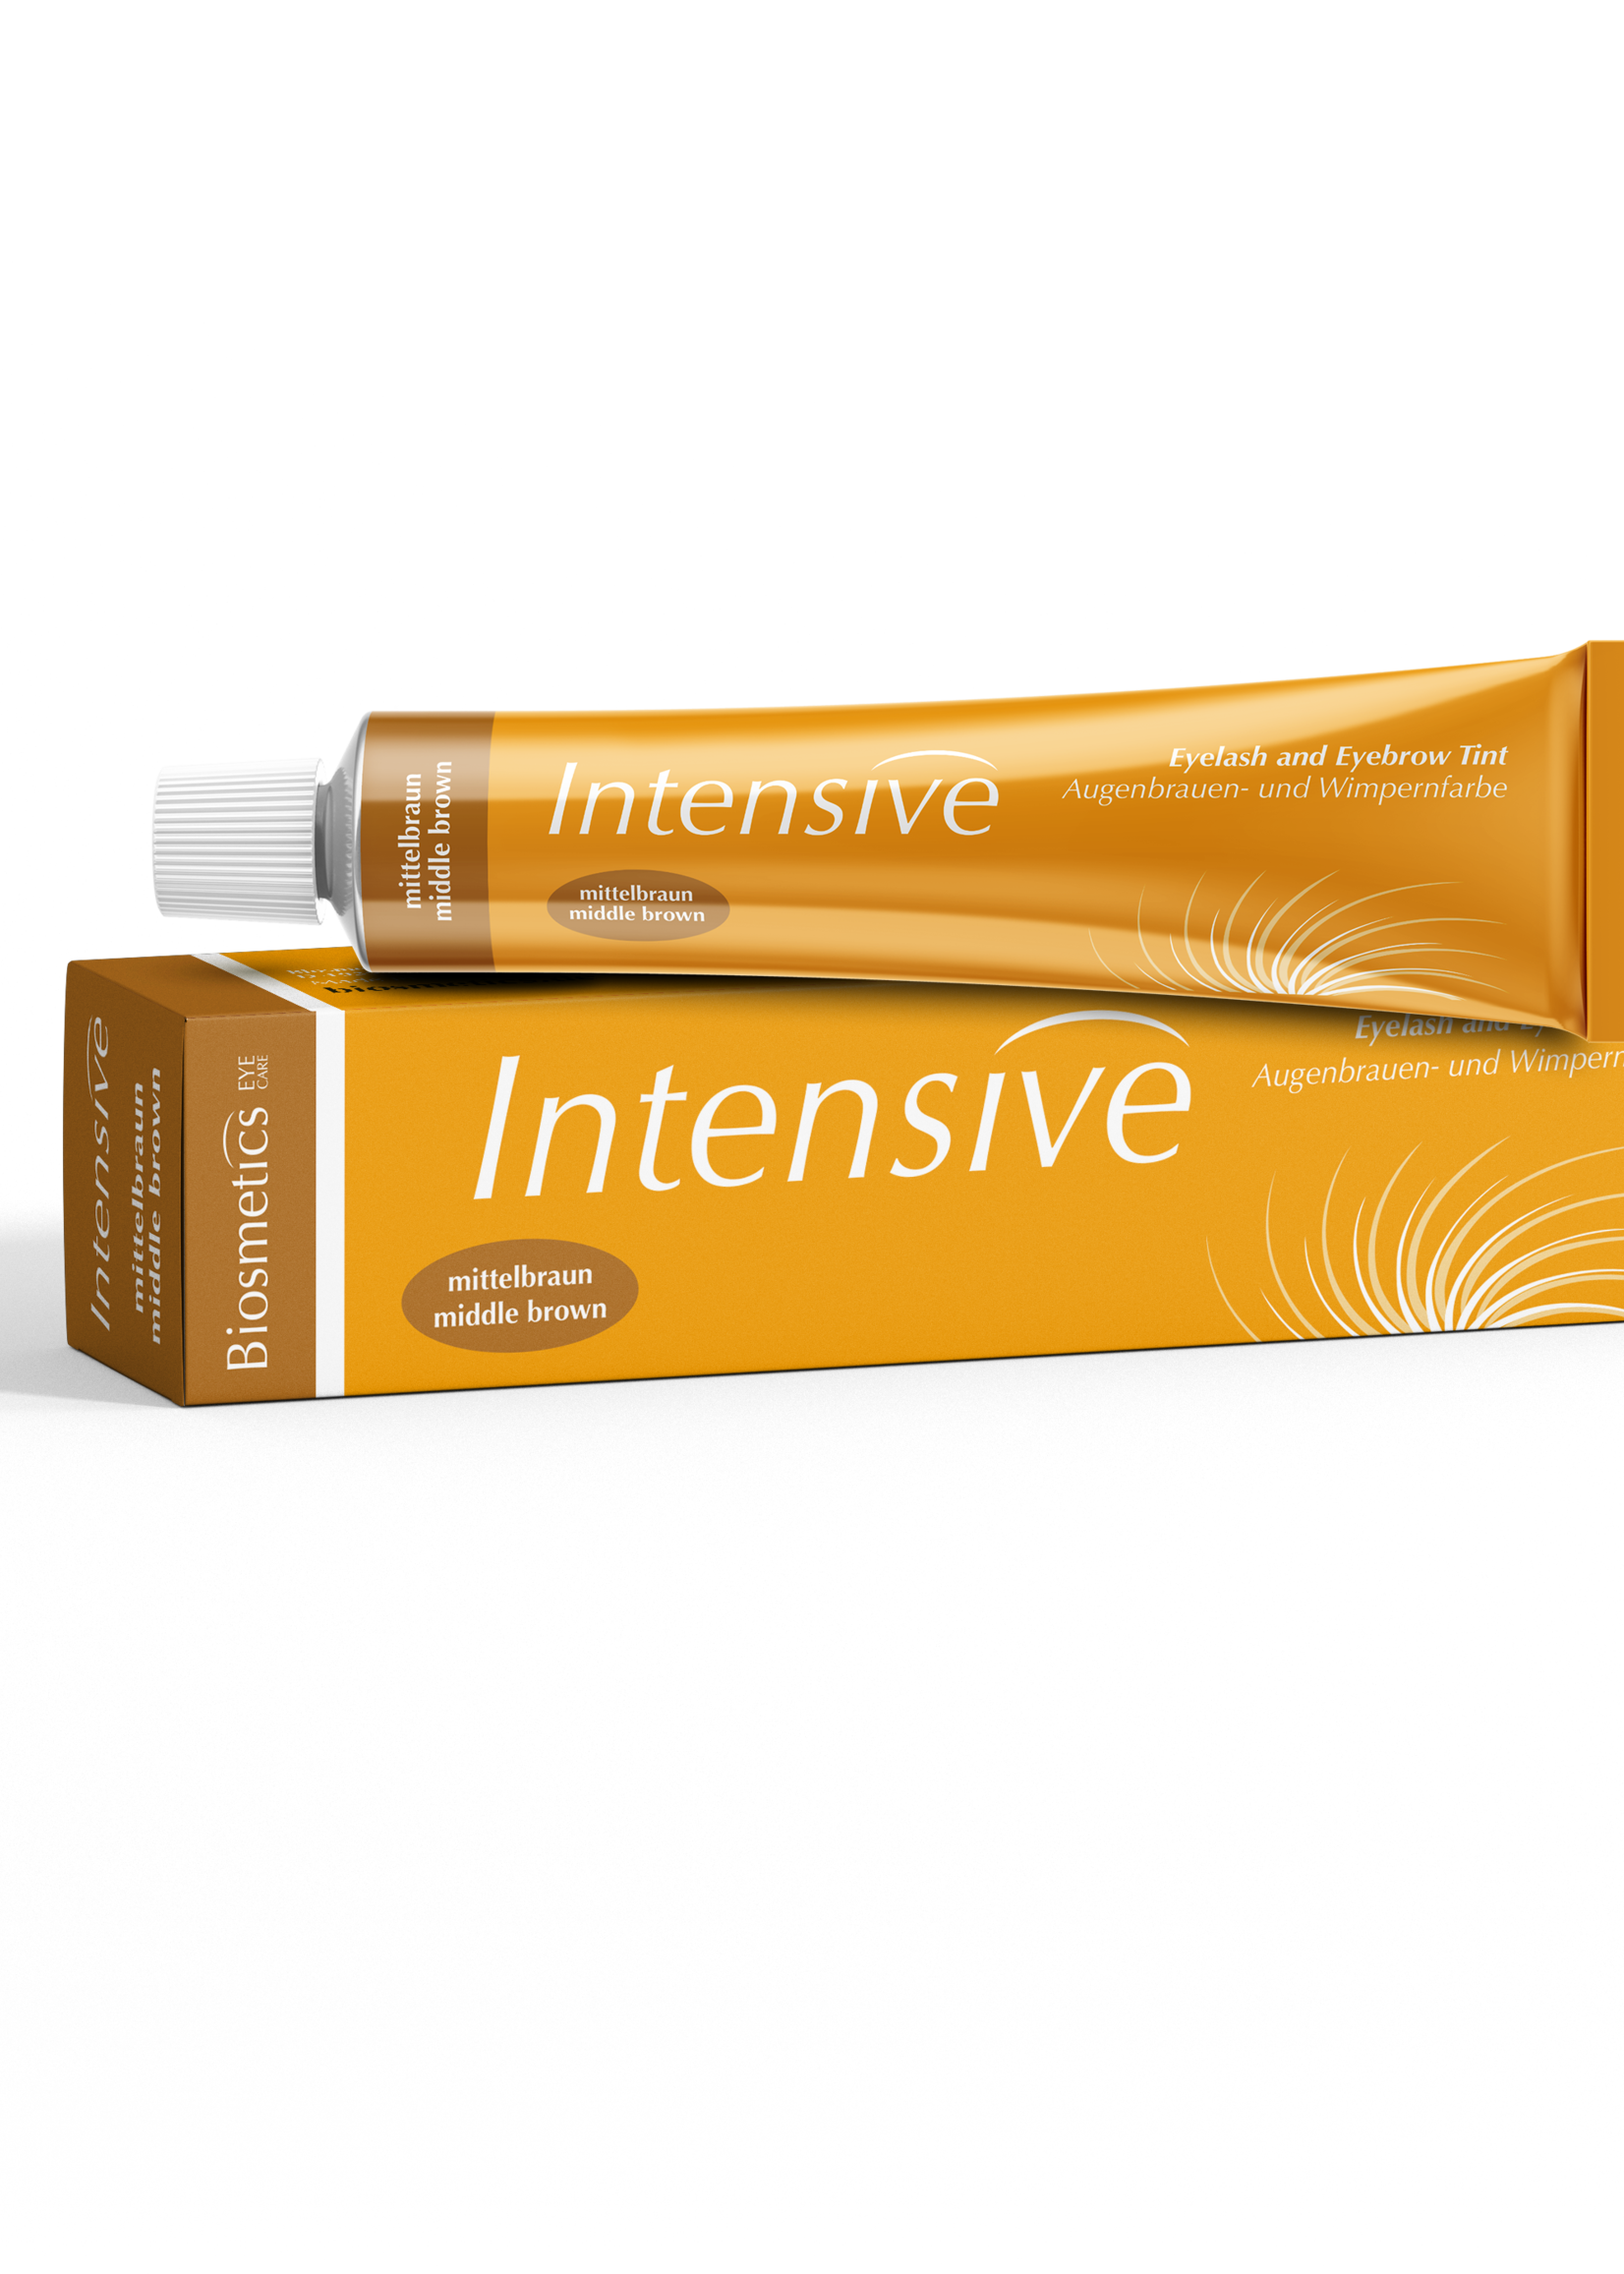 Intensive Wimpern & Augenbrauen Farbe 20 ml